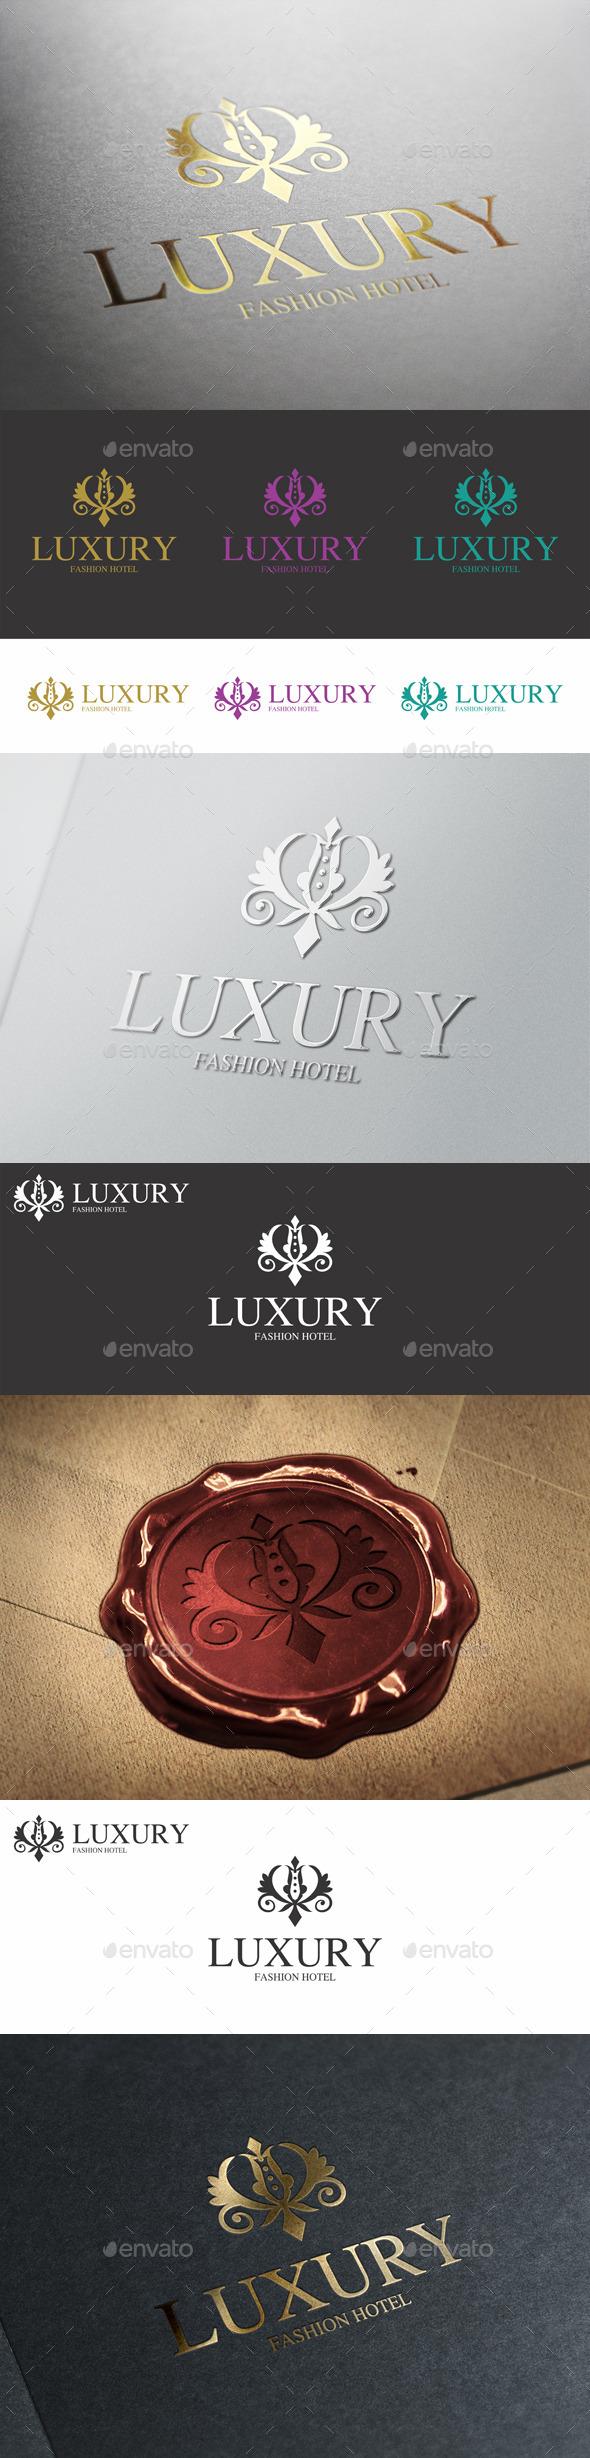 GraphicRiver Luxury Boutique Hotel Monogram Logo 10058487